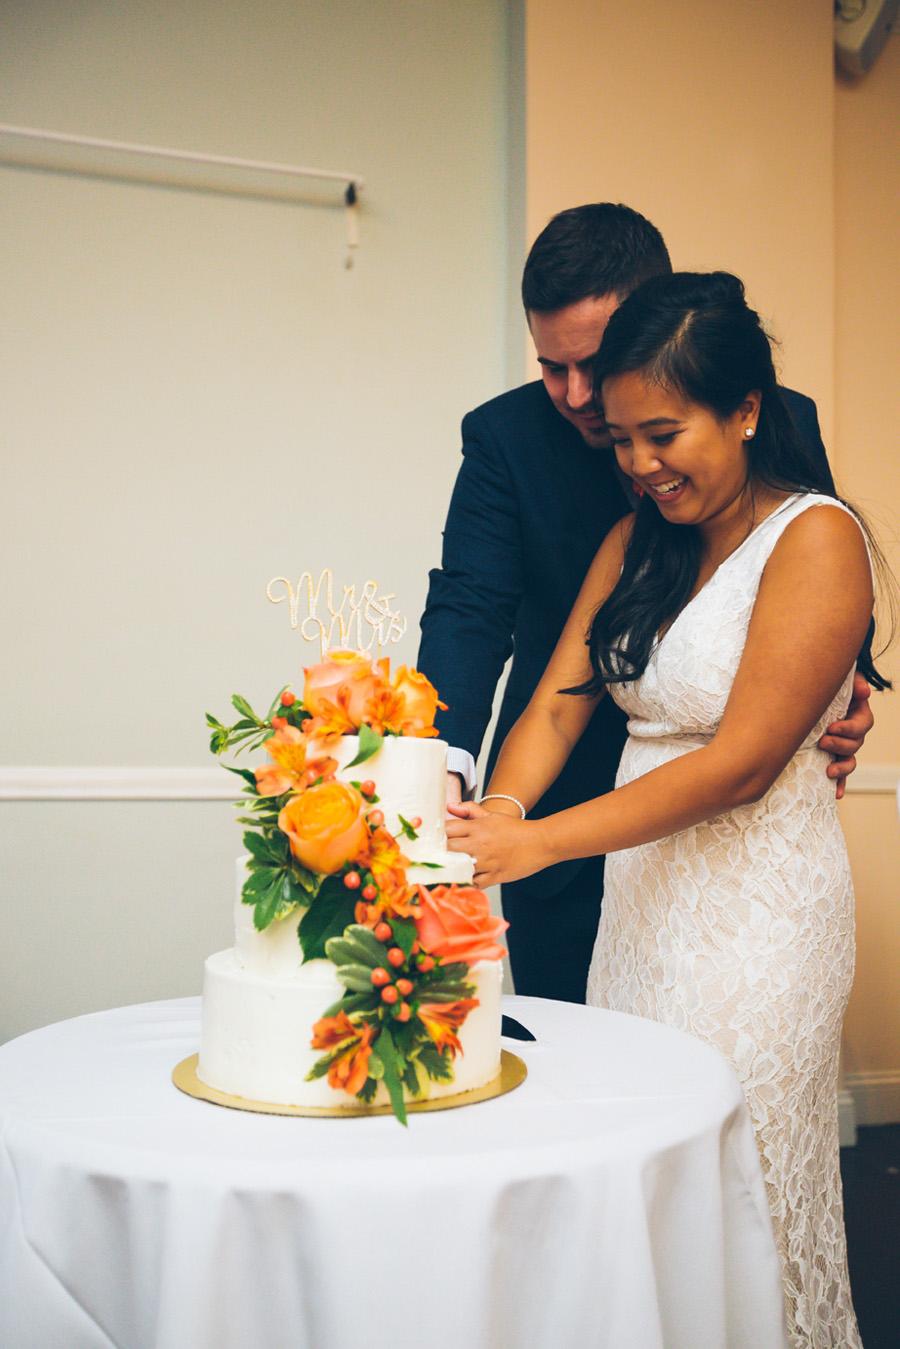 POOH-PETER-NYC-WEDDING-RECEPTION-CYNTHIACHUNG-0377.jpg